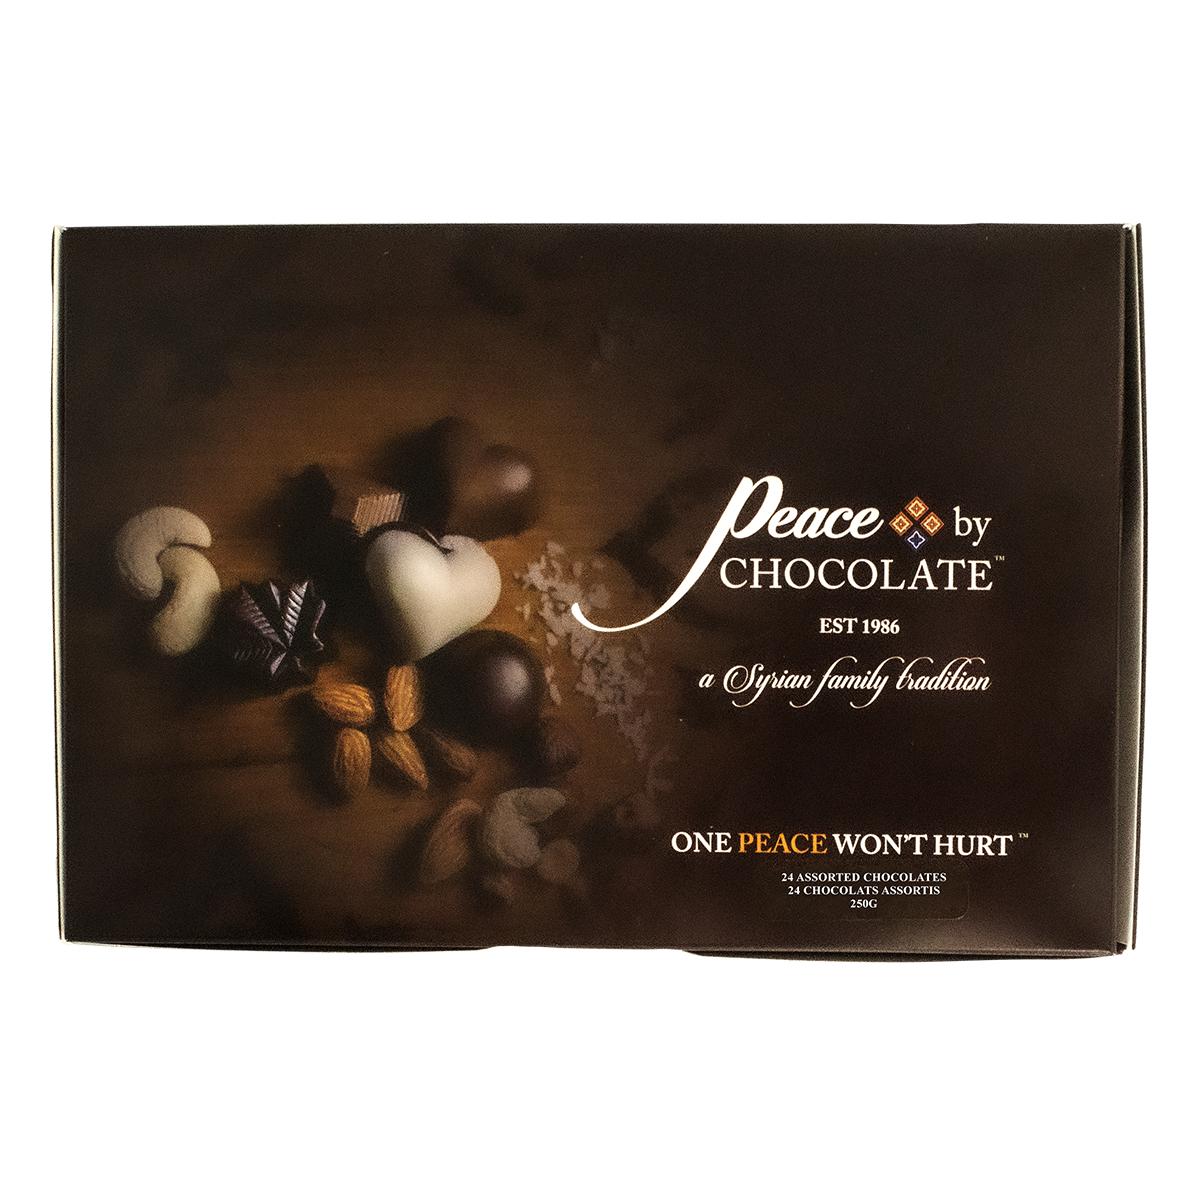 Lge Peace By Chocolate Box